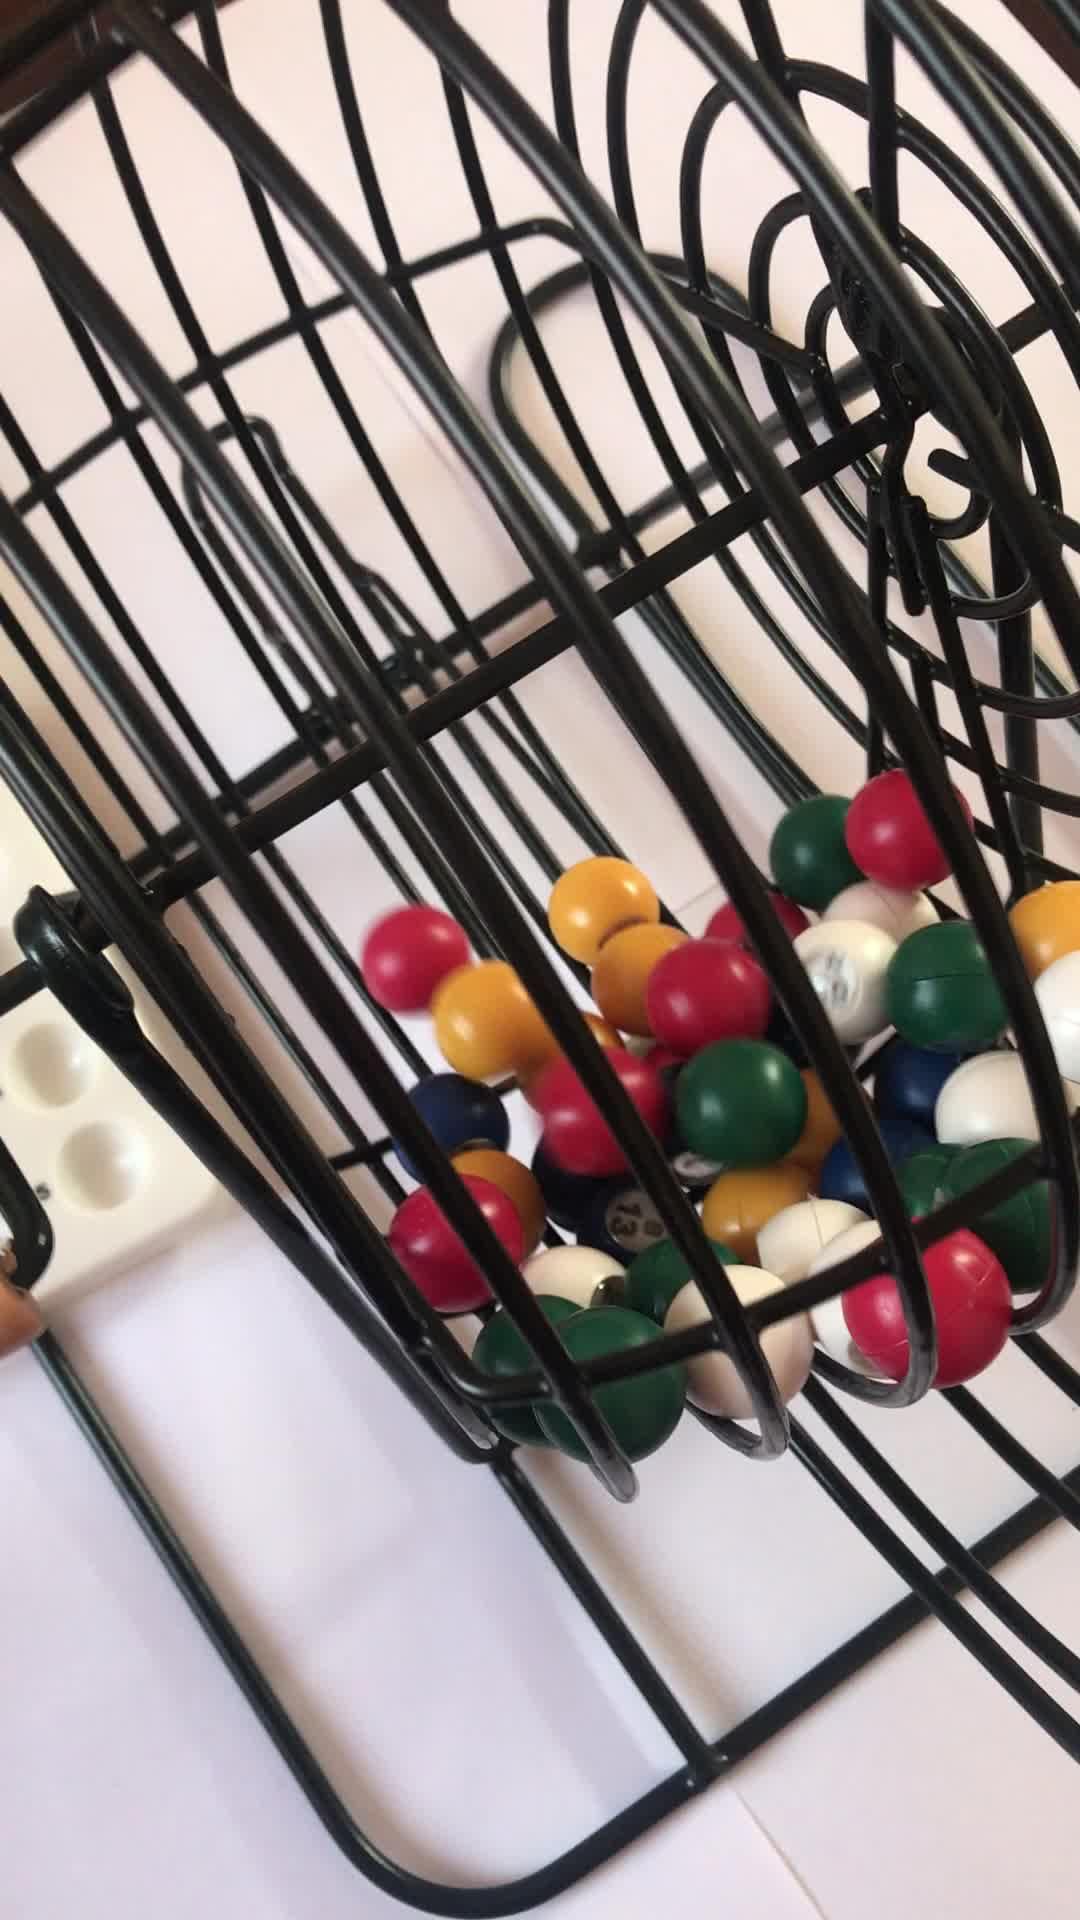 Deluxe Wire Cage Bingo Set/Bingo Supplies Jumbo Bingo Game